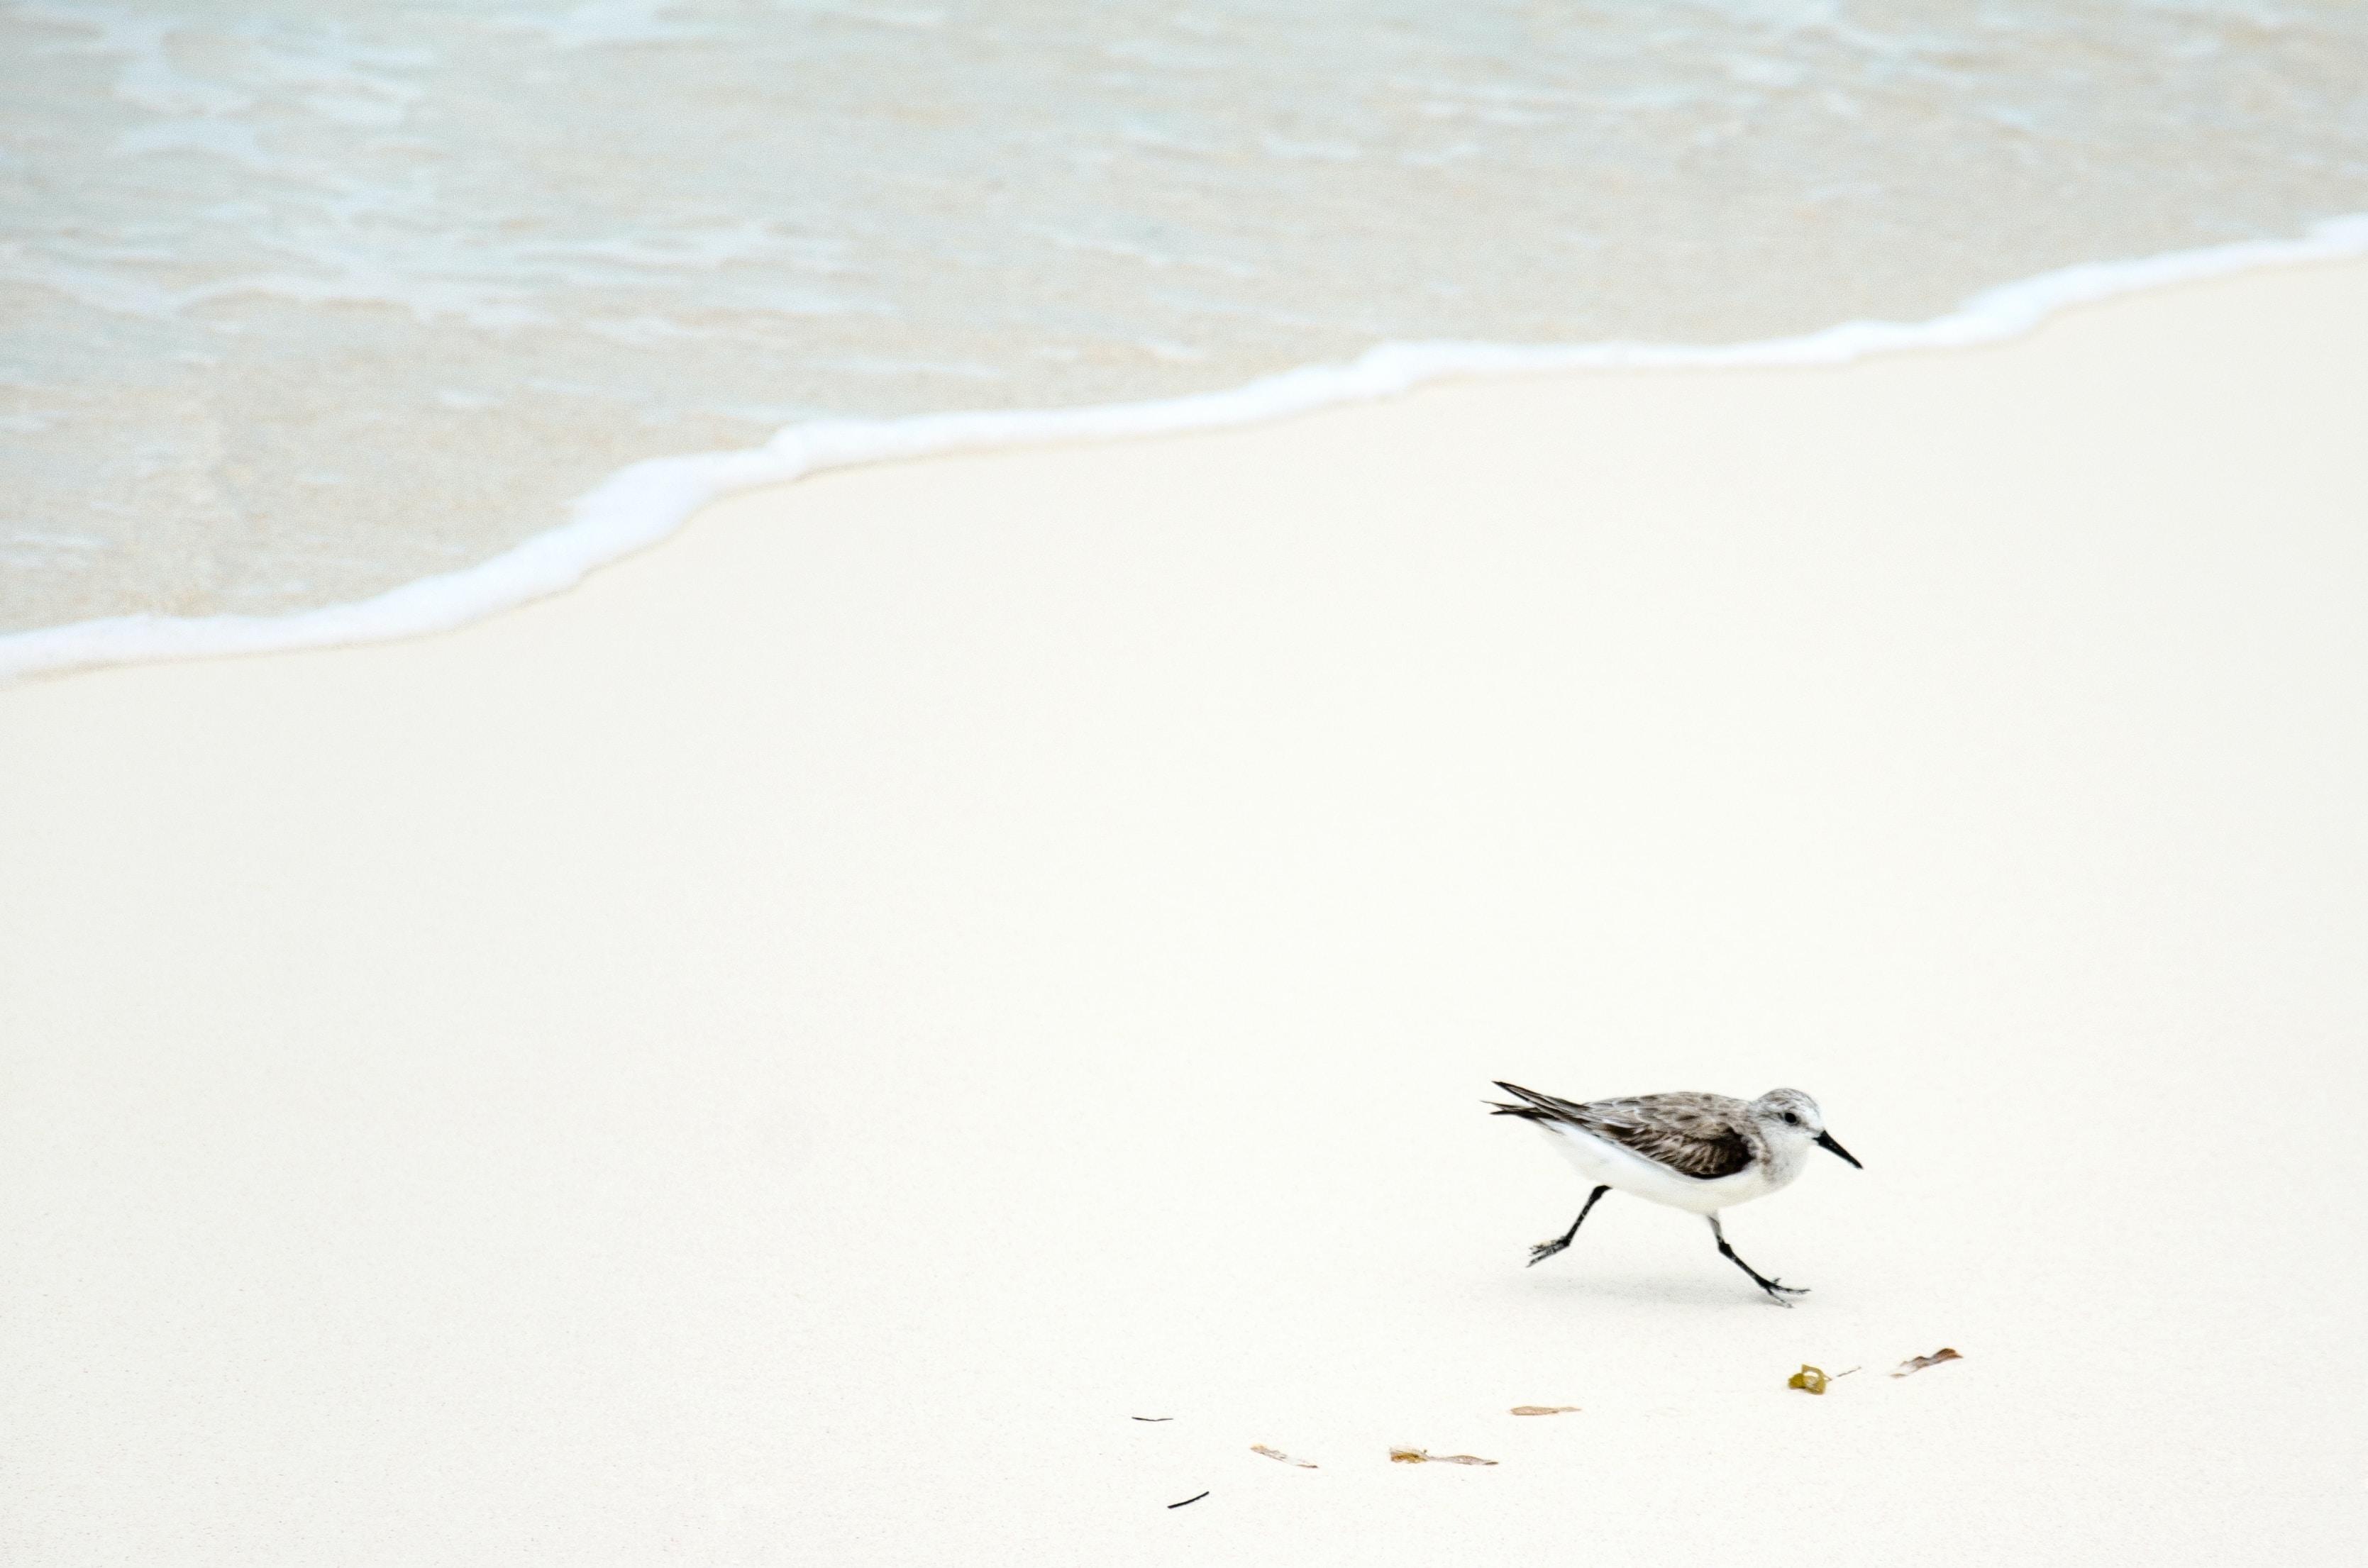 Bird on the white sand beach at Cayo Largo del Sur